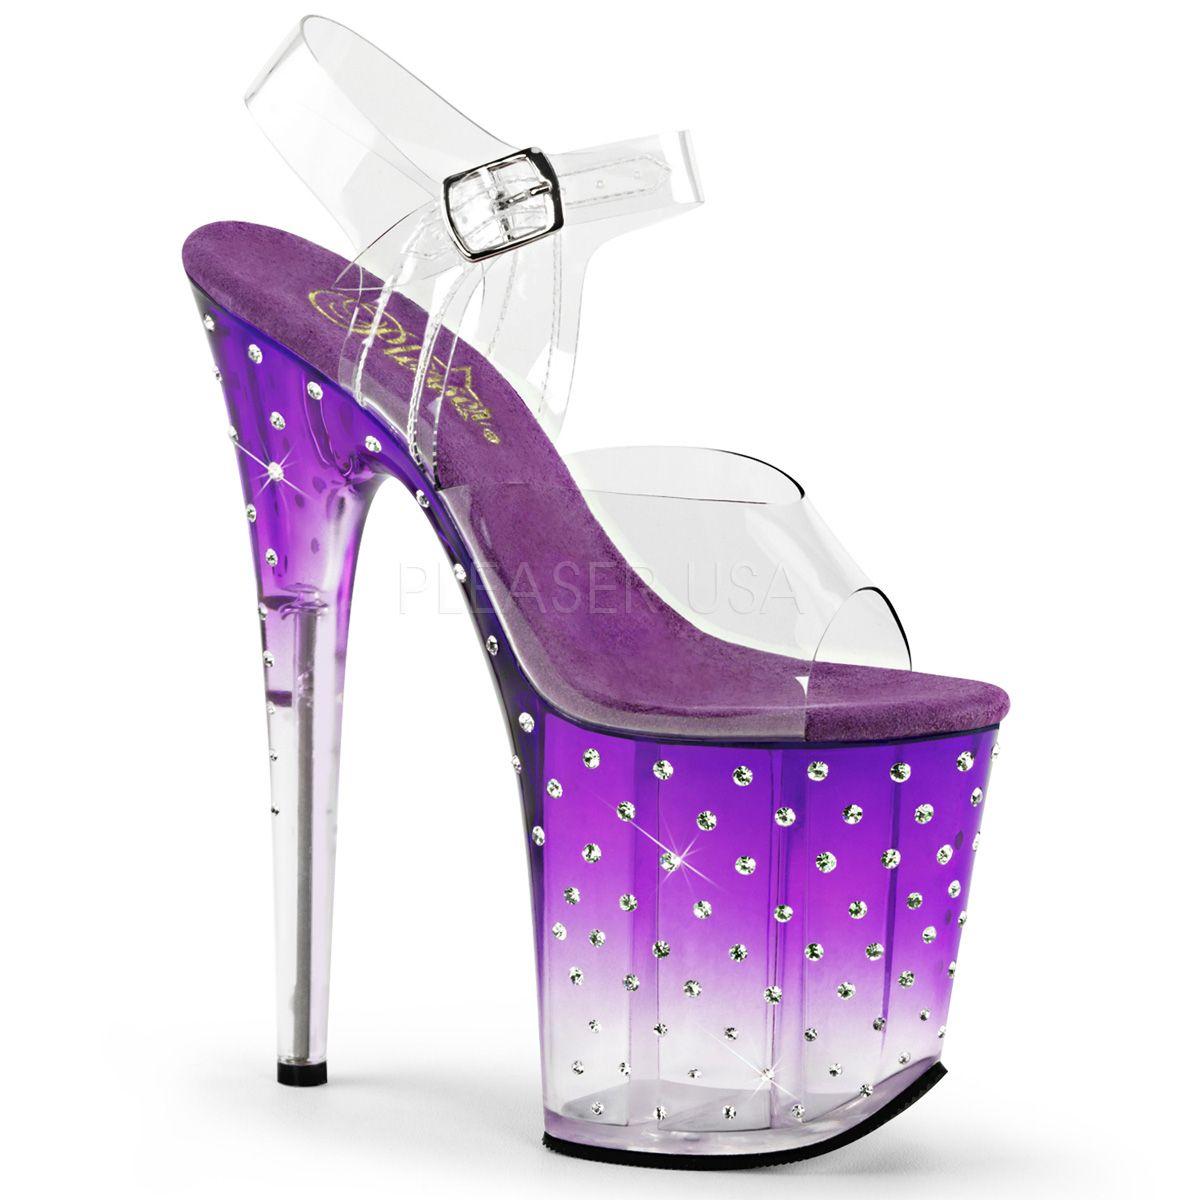 6dd4e6bab71a Over shoes. Pleaser Stardust-808T. Pleaser Stardust-808T Stripper Heels